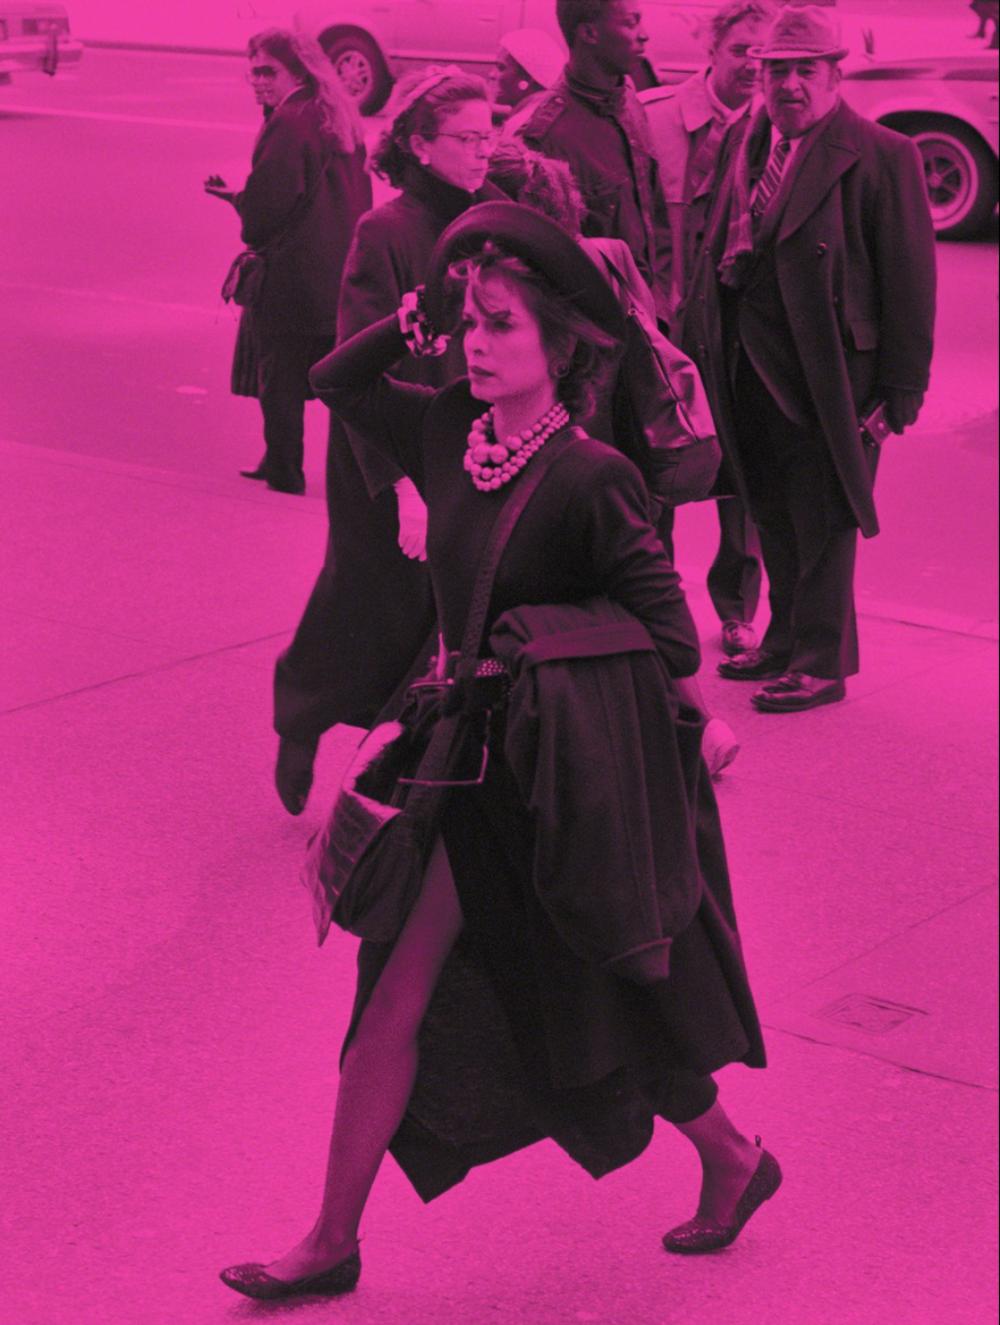 Christophe Von Hohenberg   Andy Warhol Memorial, 1987: Bianca Jagger Arriving  Digital Print on Archival Hahnemühle Paper 55.9 × 43.2 cm